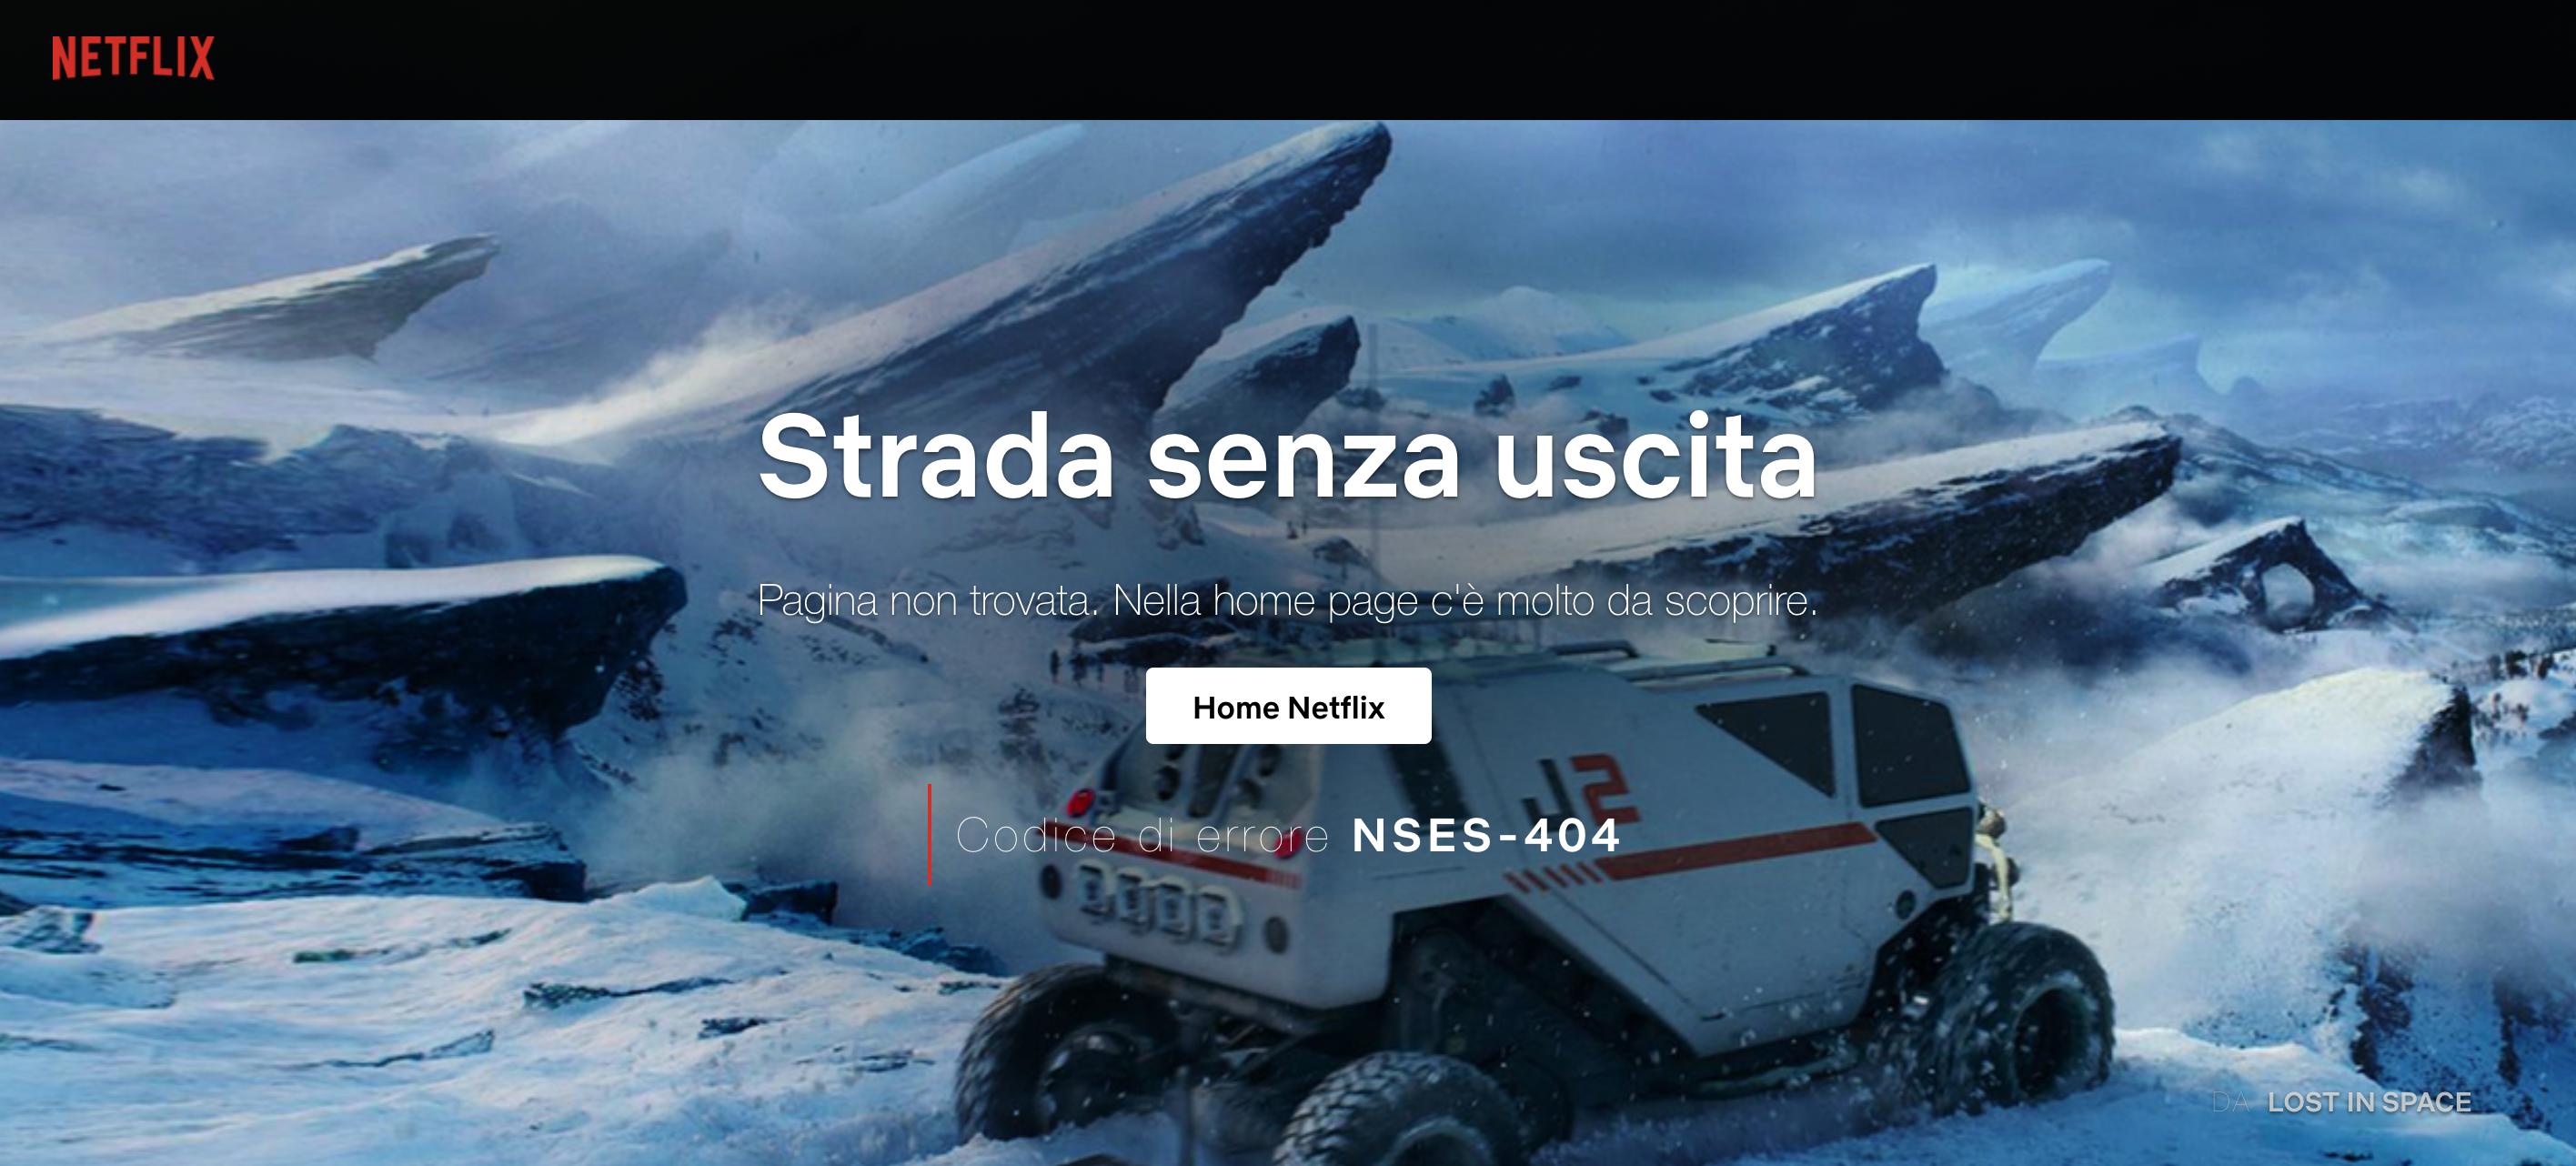 Error 404 Netflix